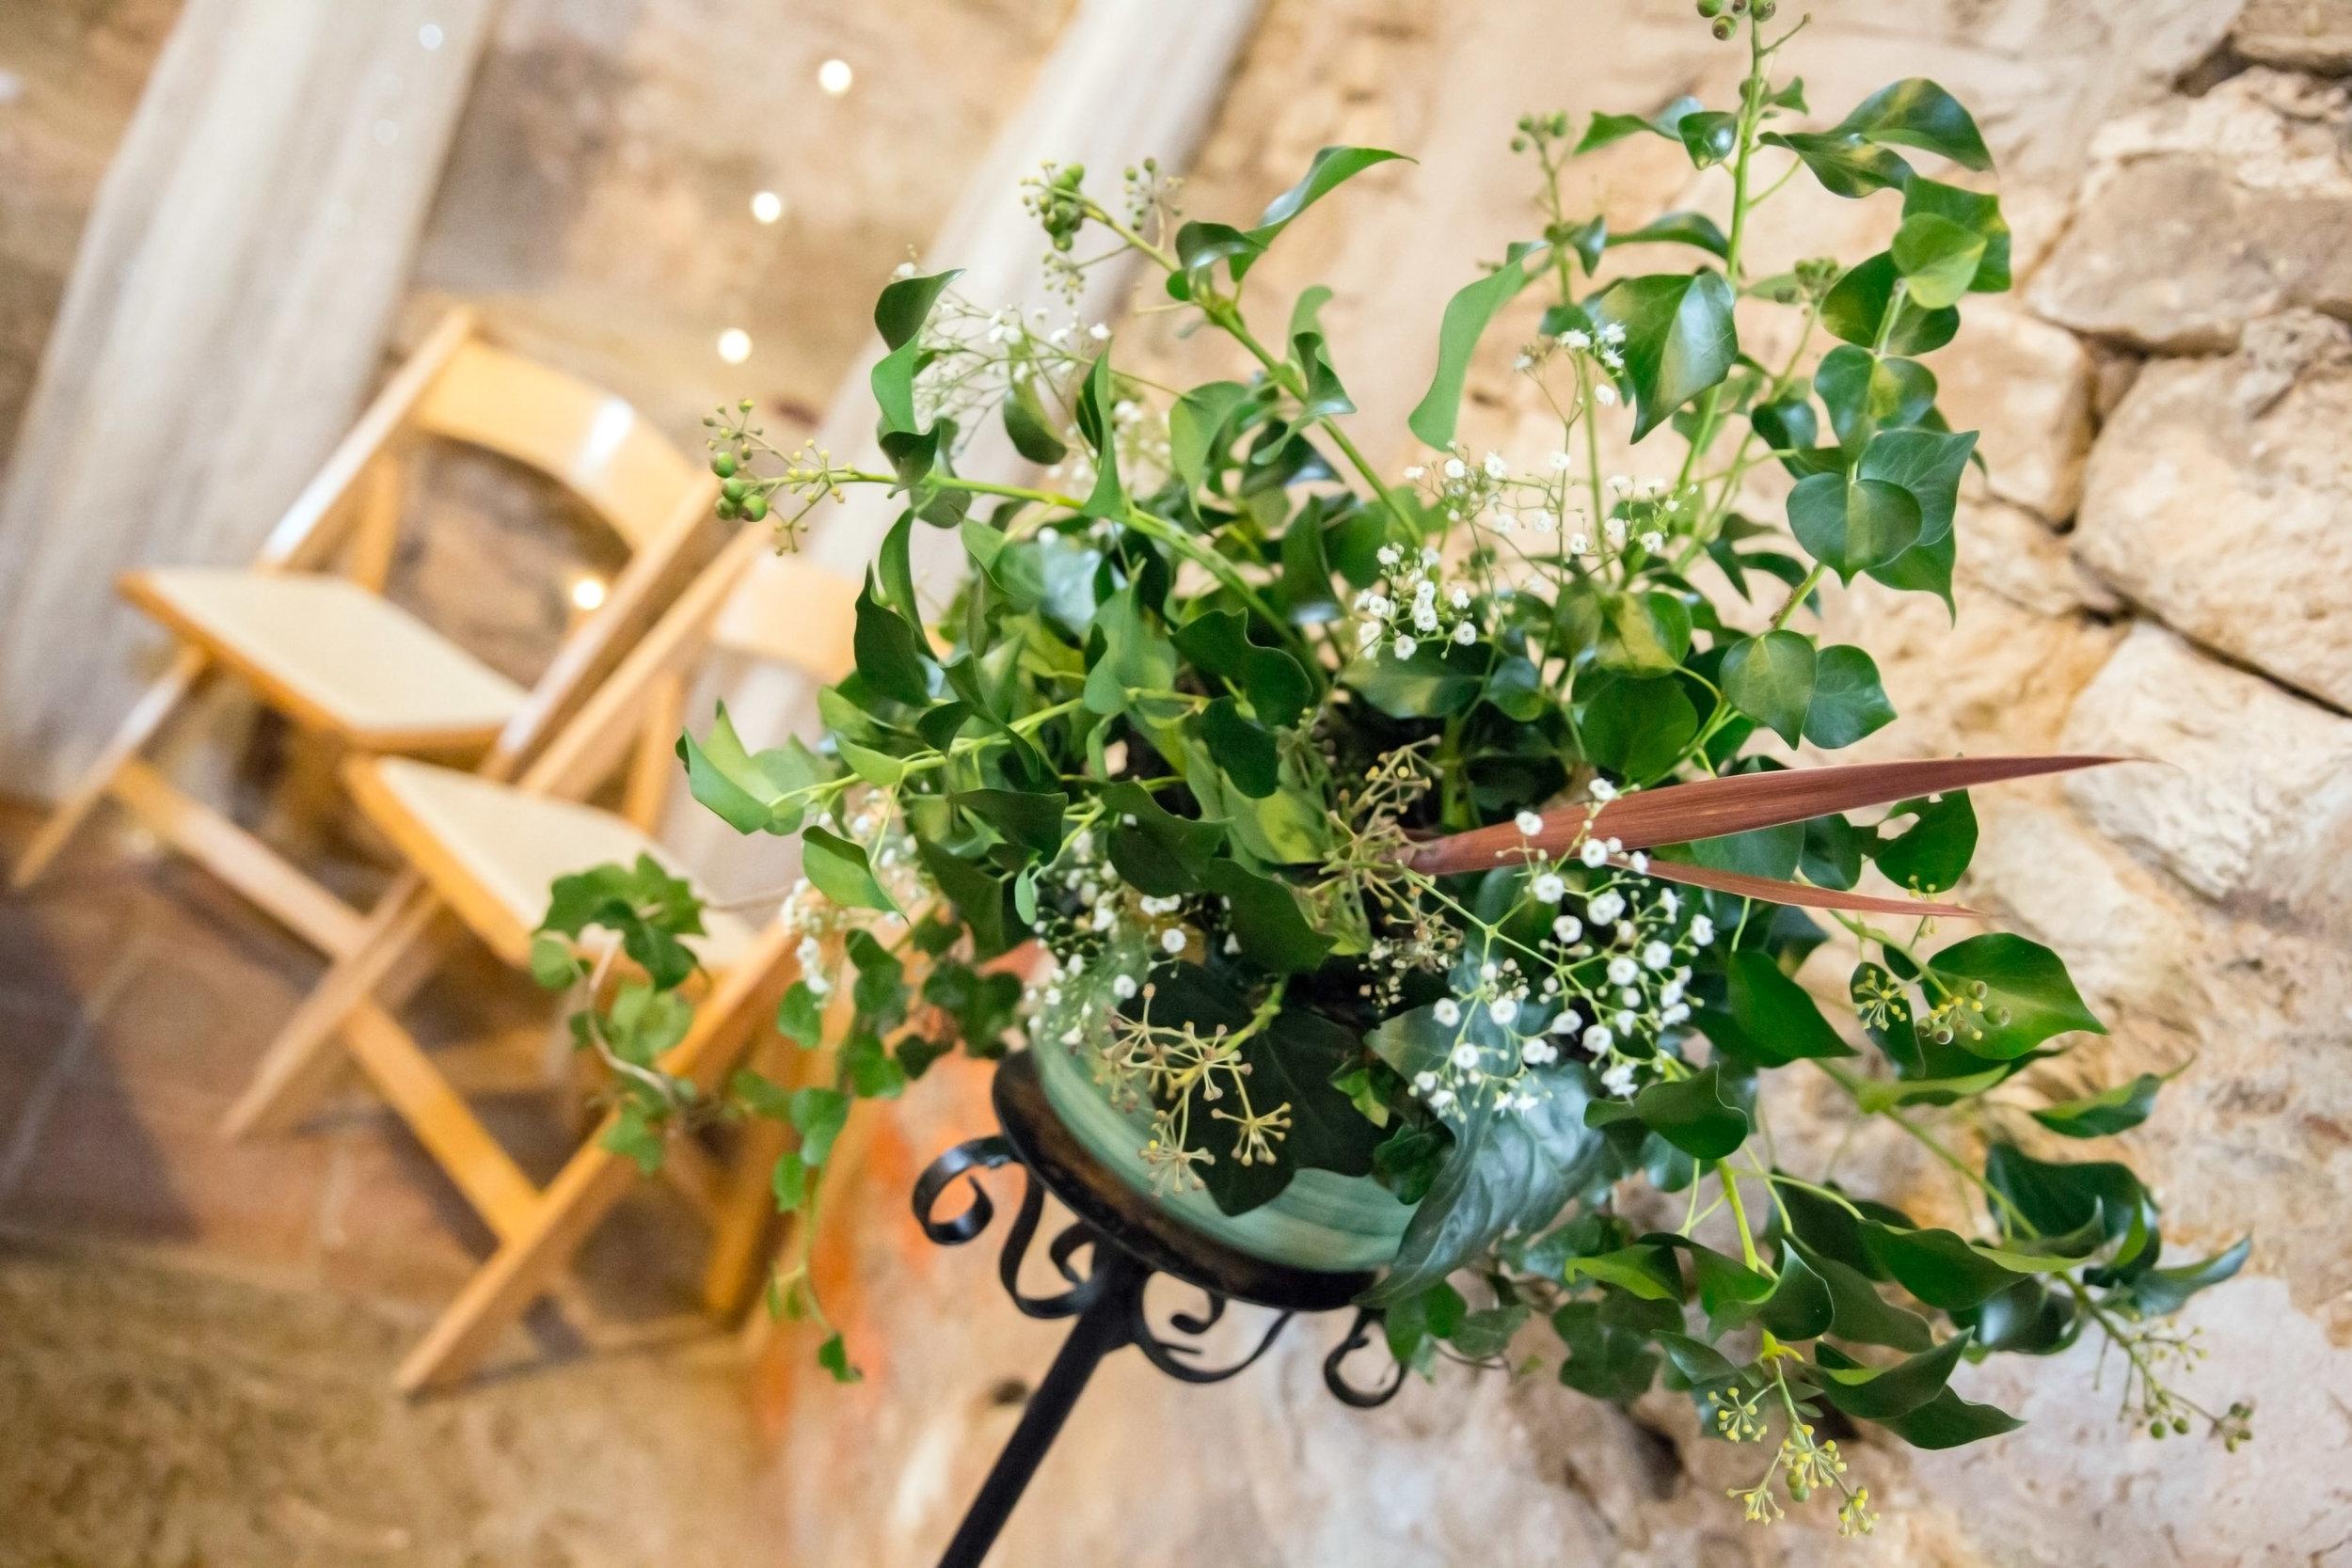 Jess & Ben - Bristol Wedding Photographer - Wright Wedding Photography - 18